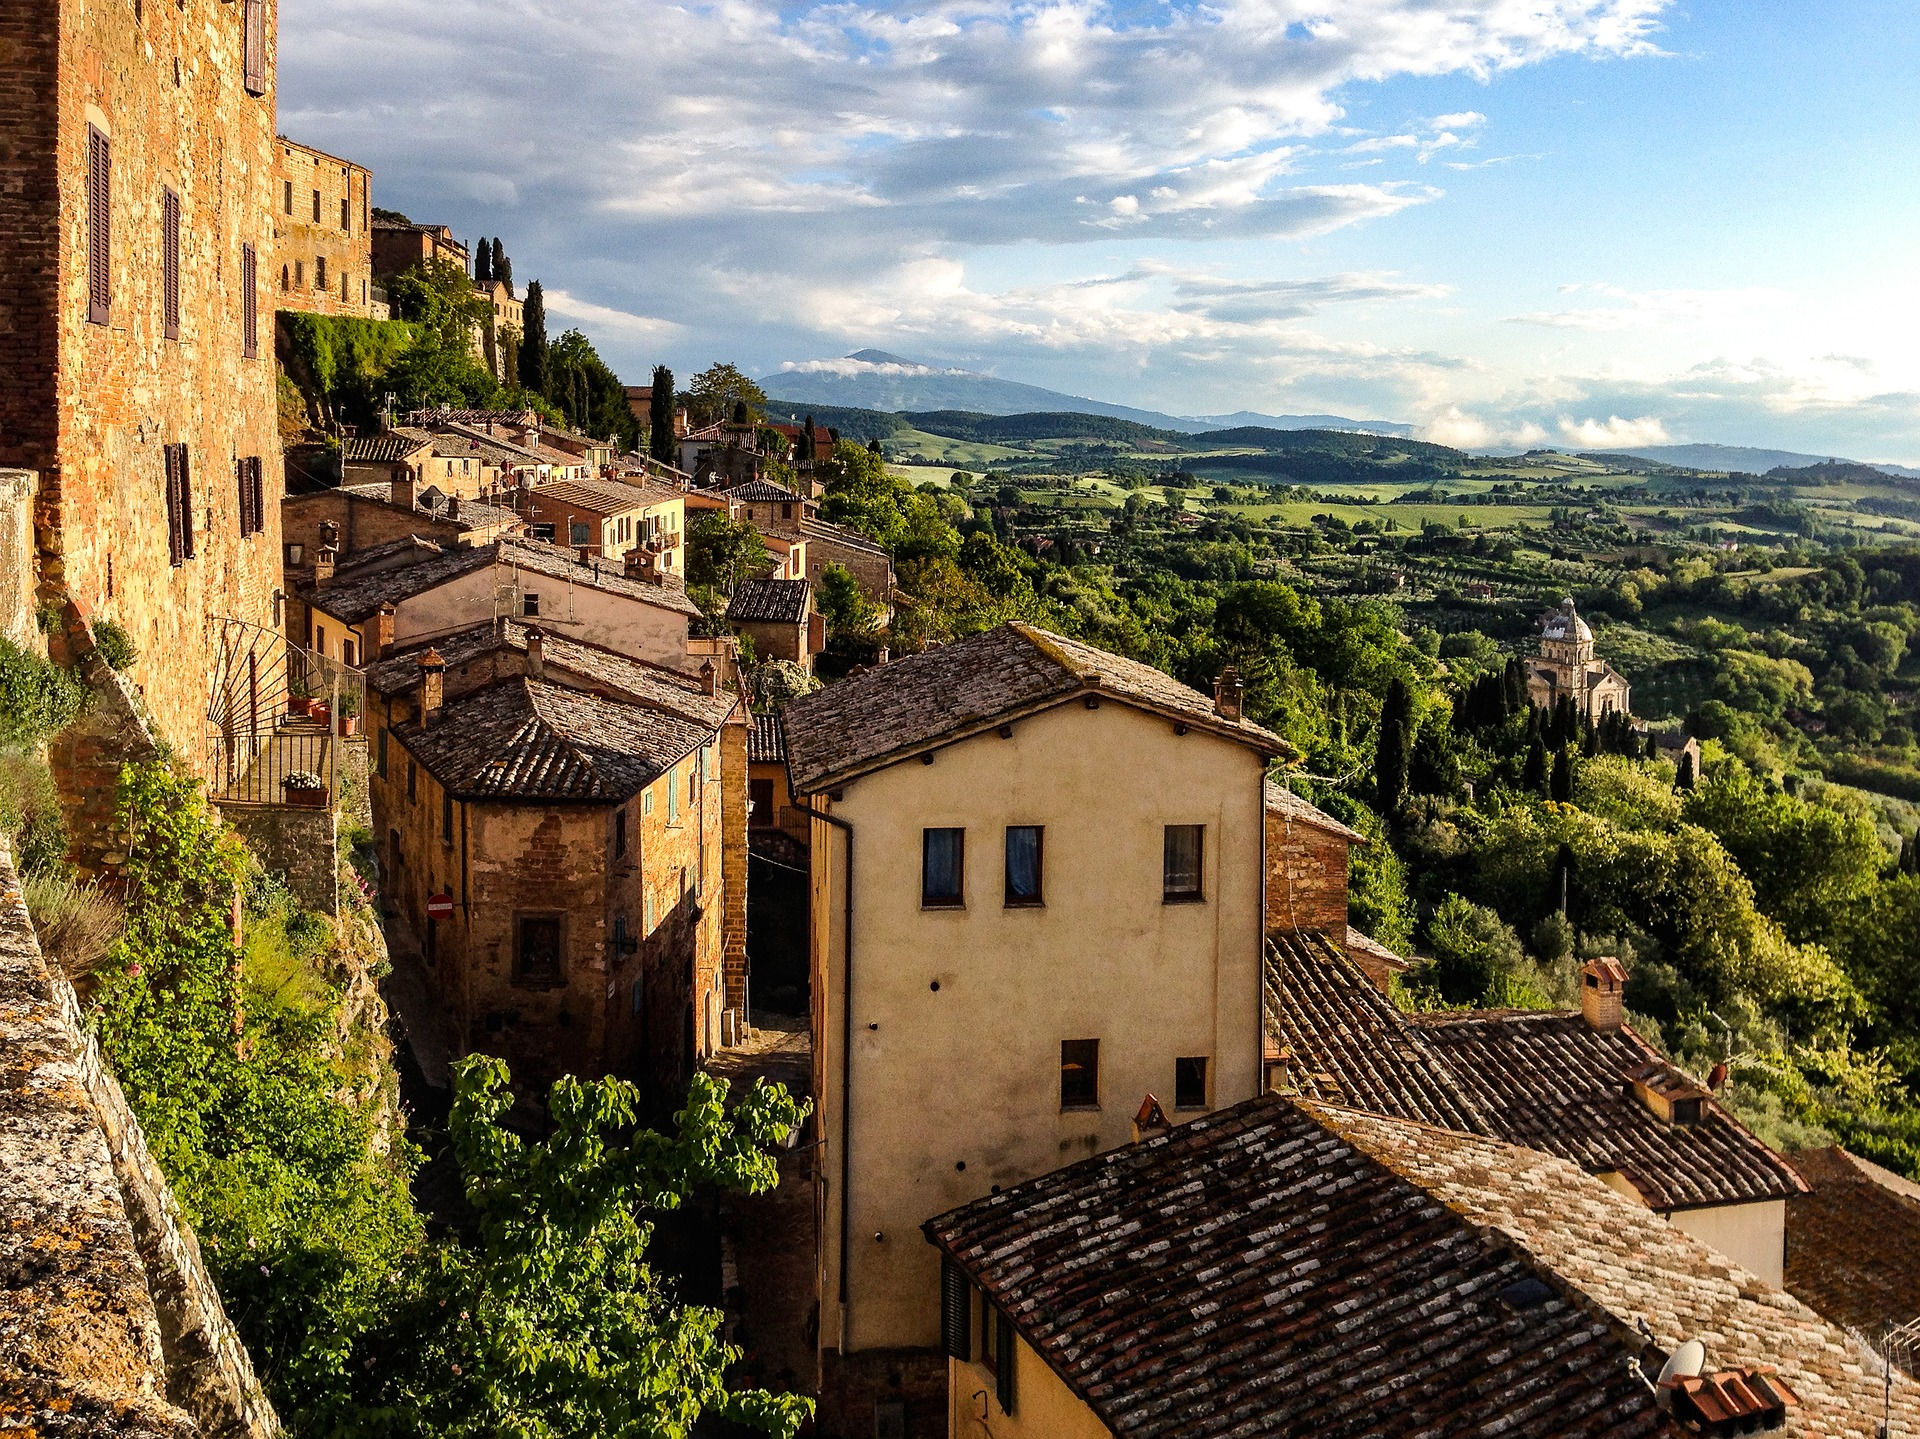 Montepulciano in Toscana